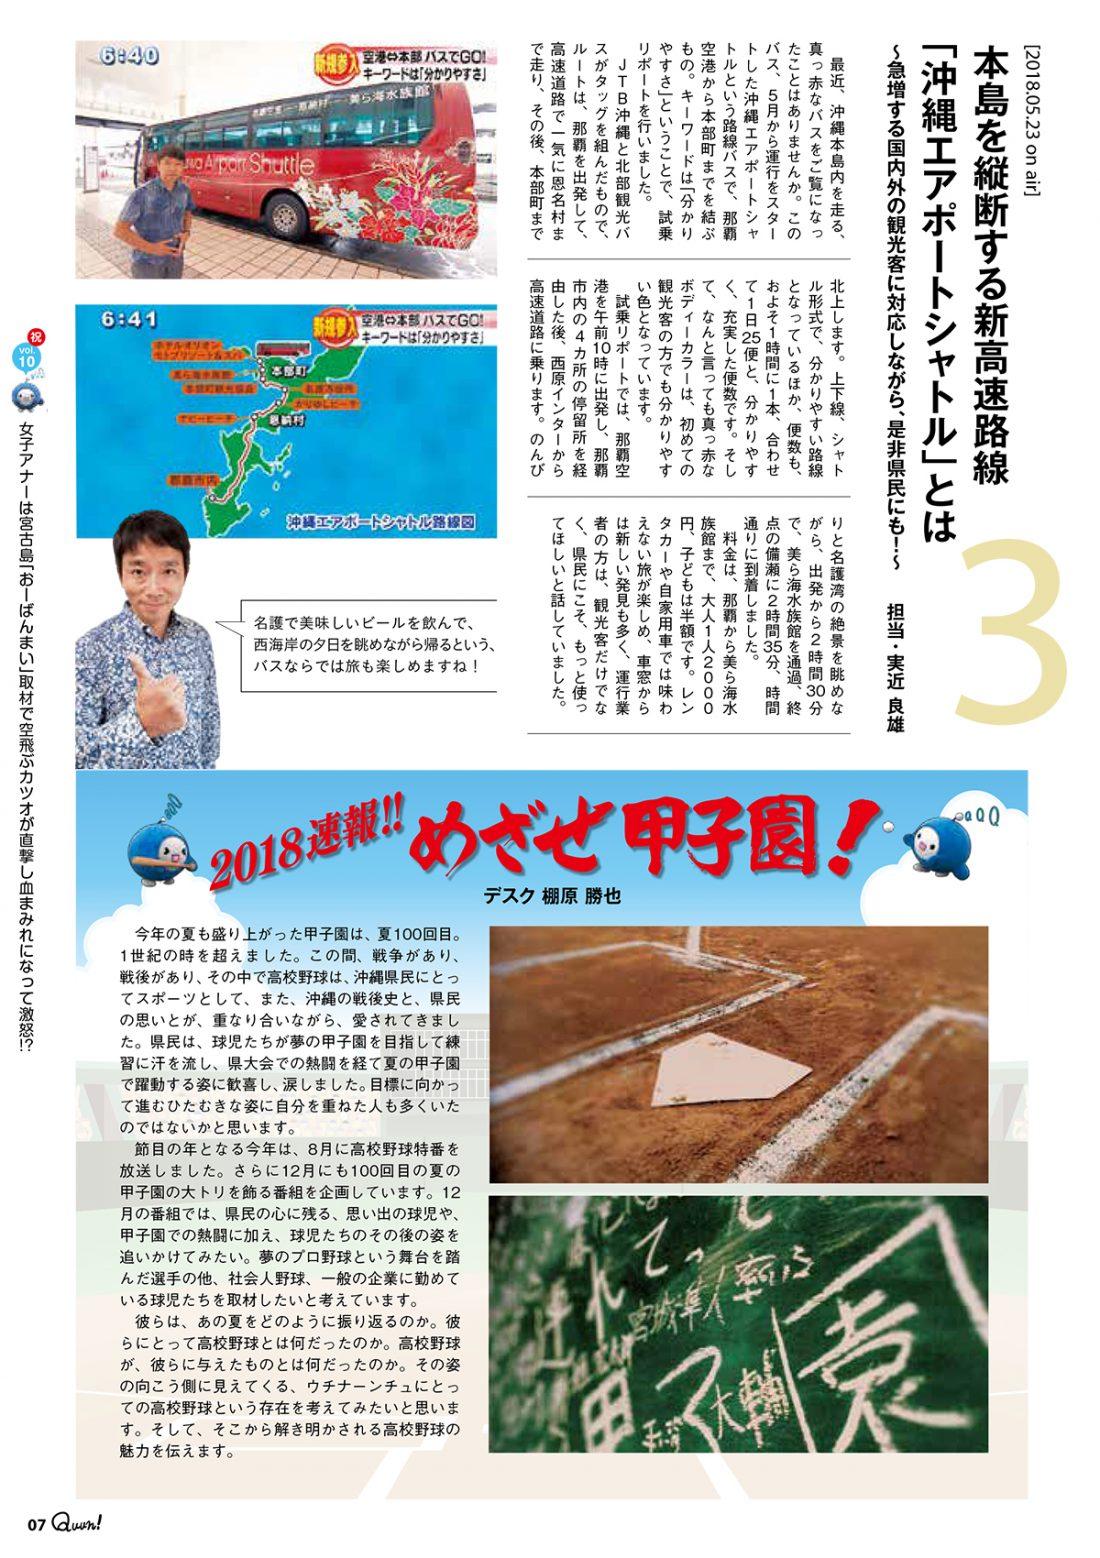 http://www.qab.co.jp/qgoro/wp-content/uploads/quun_1009-1100x1558.jpg